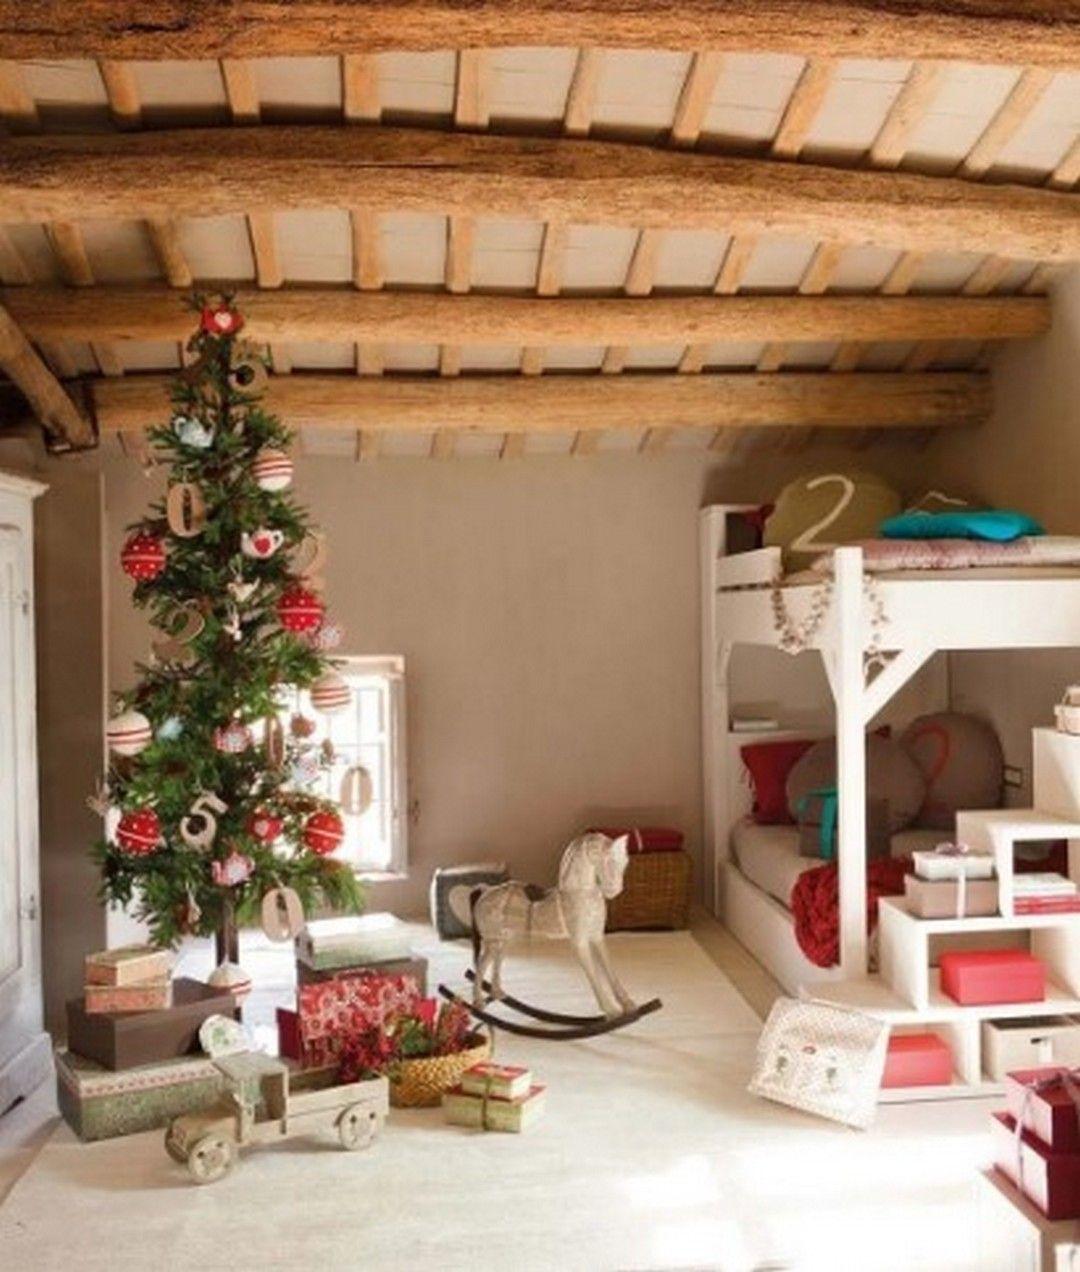 8 Inspiration Rustic Farmhouse Wood Christmas Looks Beautiful #bodenvasedekorieren